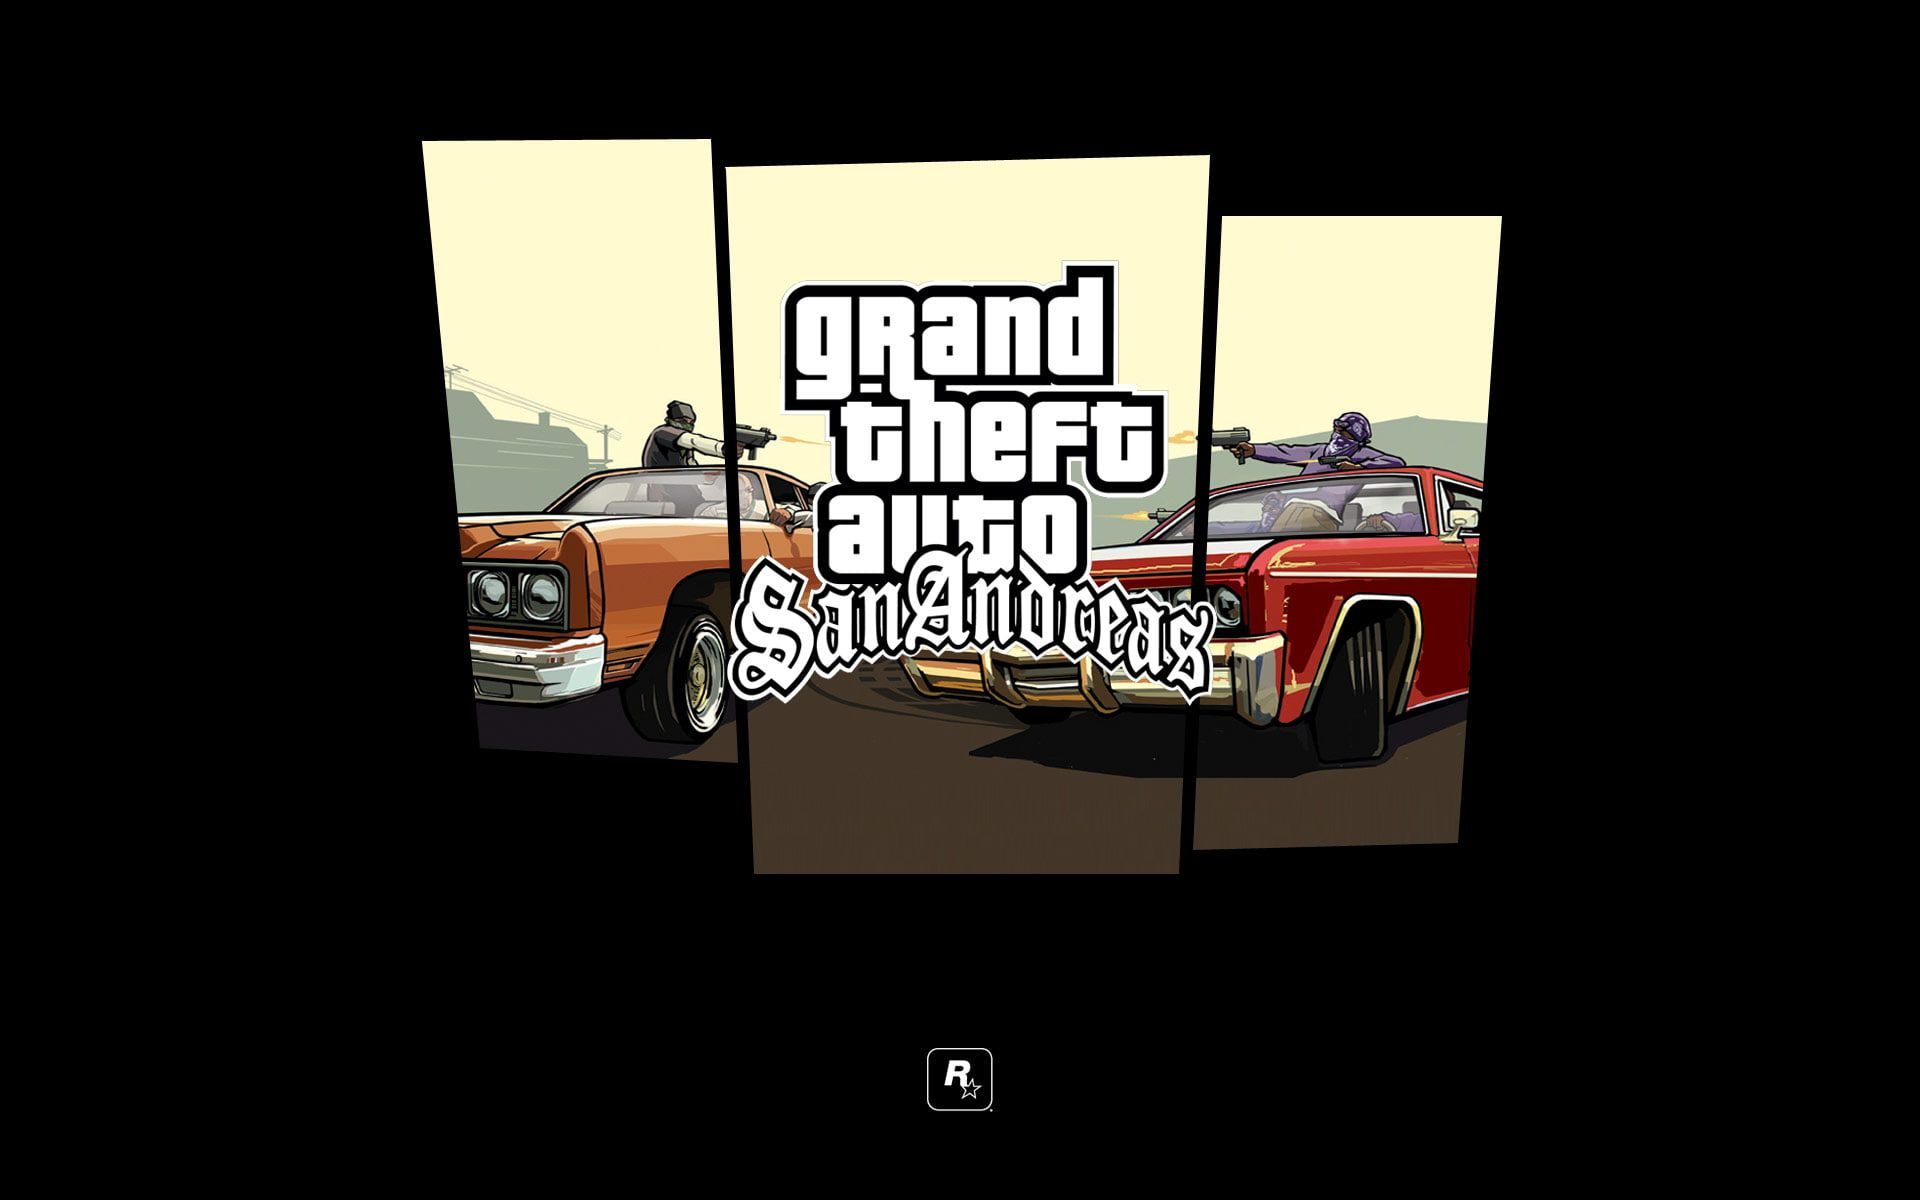 Grand Theft Auto San Andreas Wallpaper Machine Logo Shooting Gta Rockstar Grand Theft Auto San Andreas Gang In 2021 San Andreas Game San Andreas Grand Theft Auto